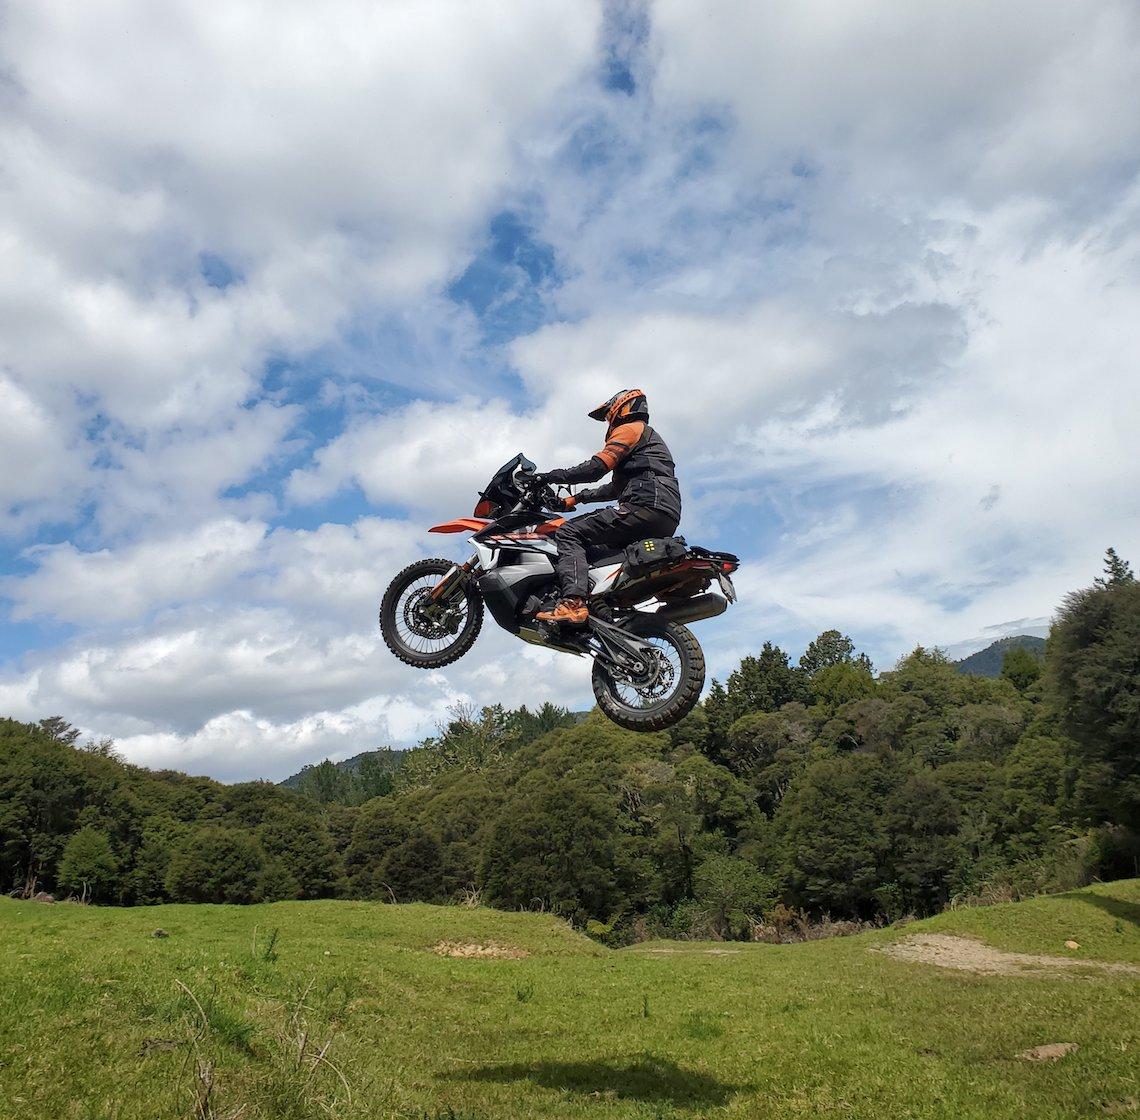 Chris Birch jump